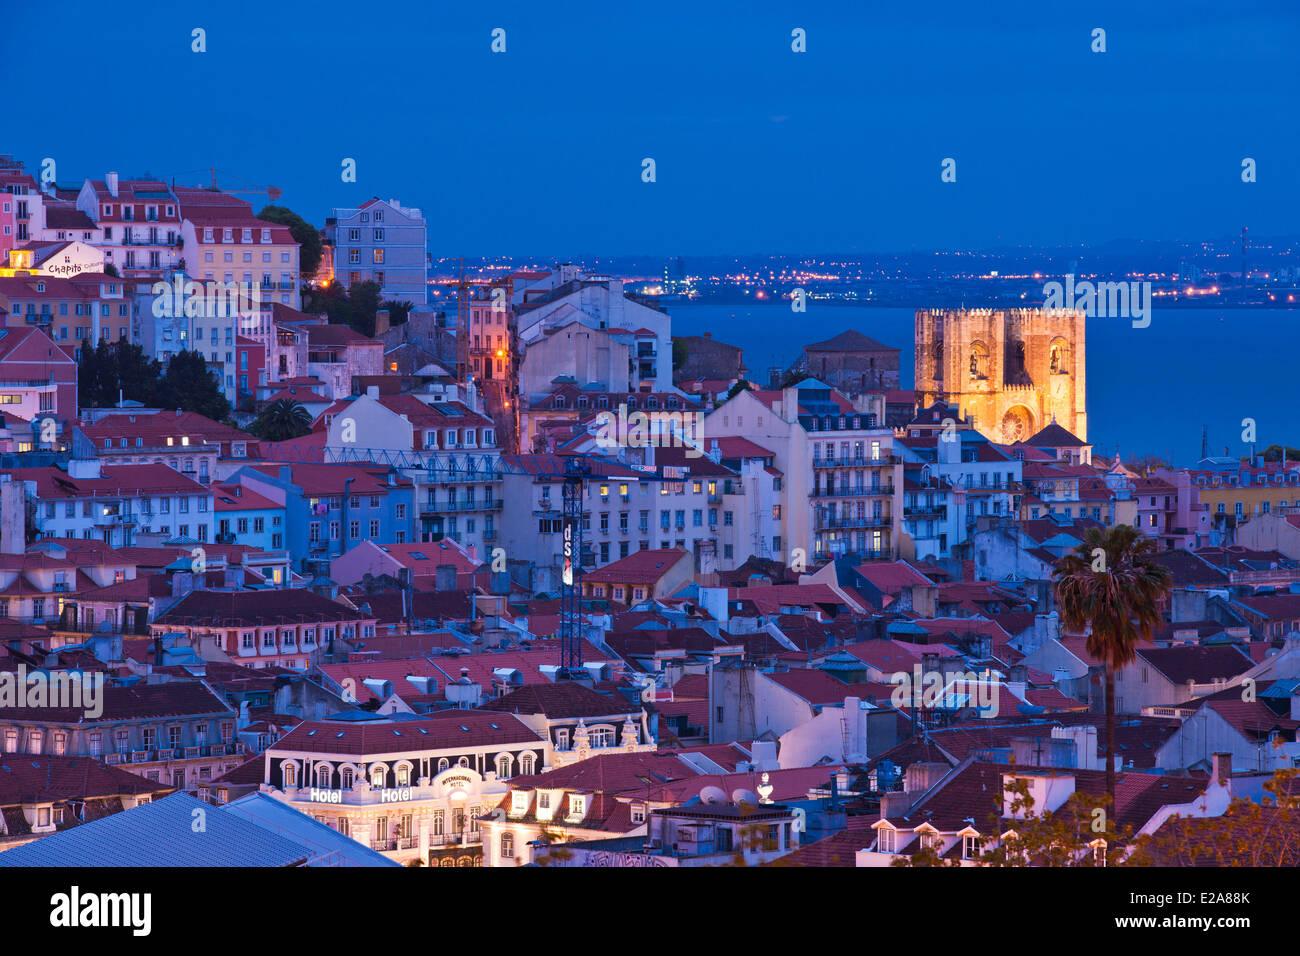 Portugal, Lisbon, panorama from the viewpoint Sao Pedro de Alcantara - Stock Image